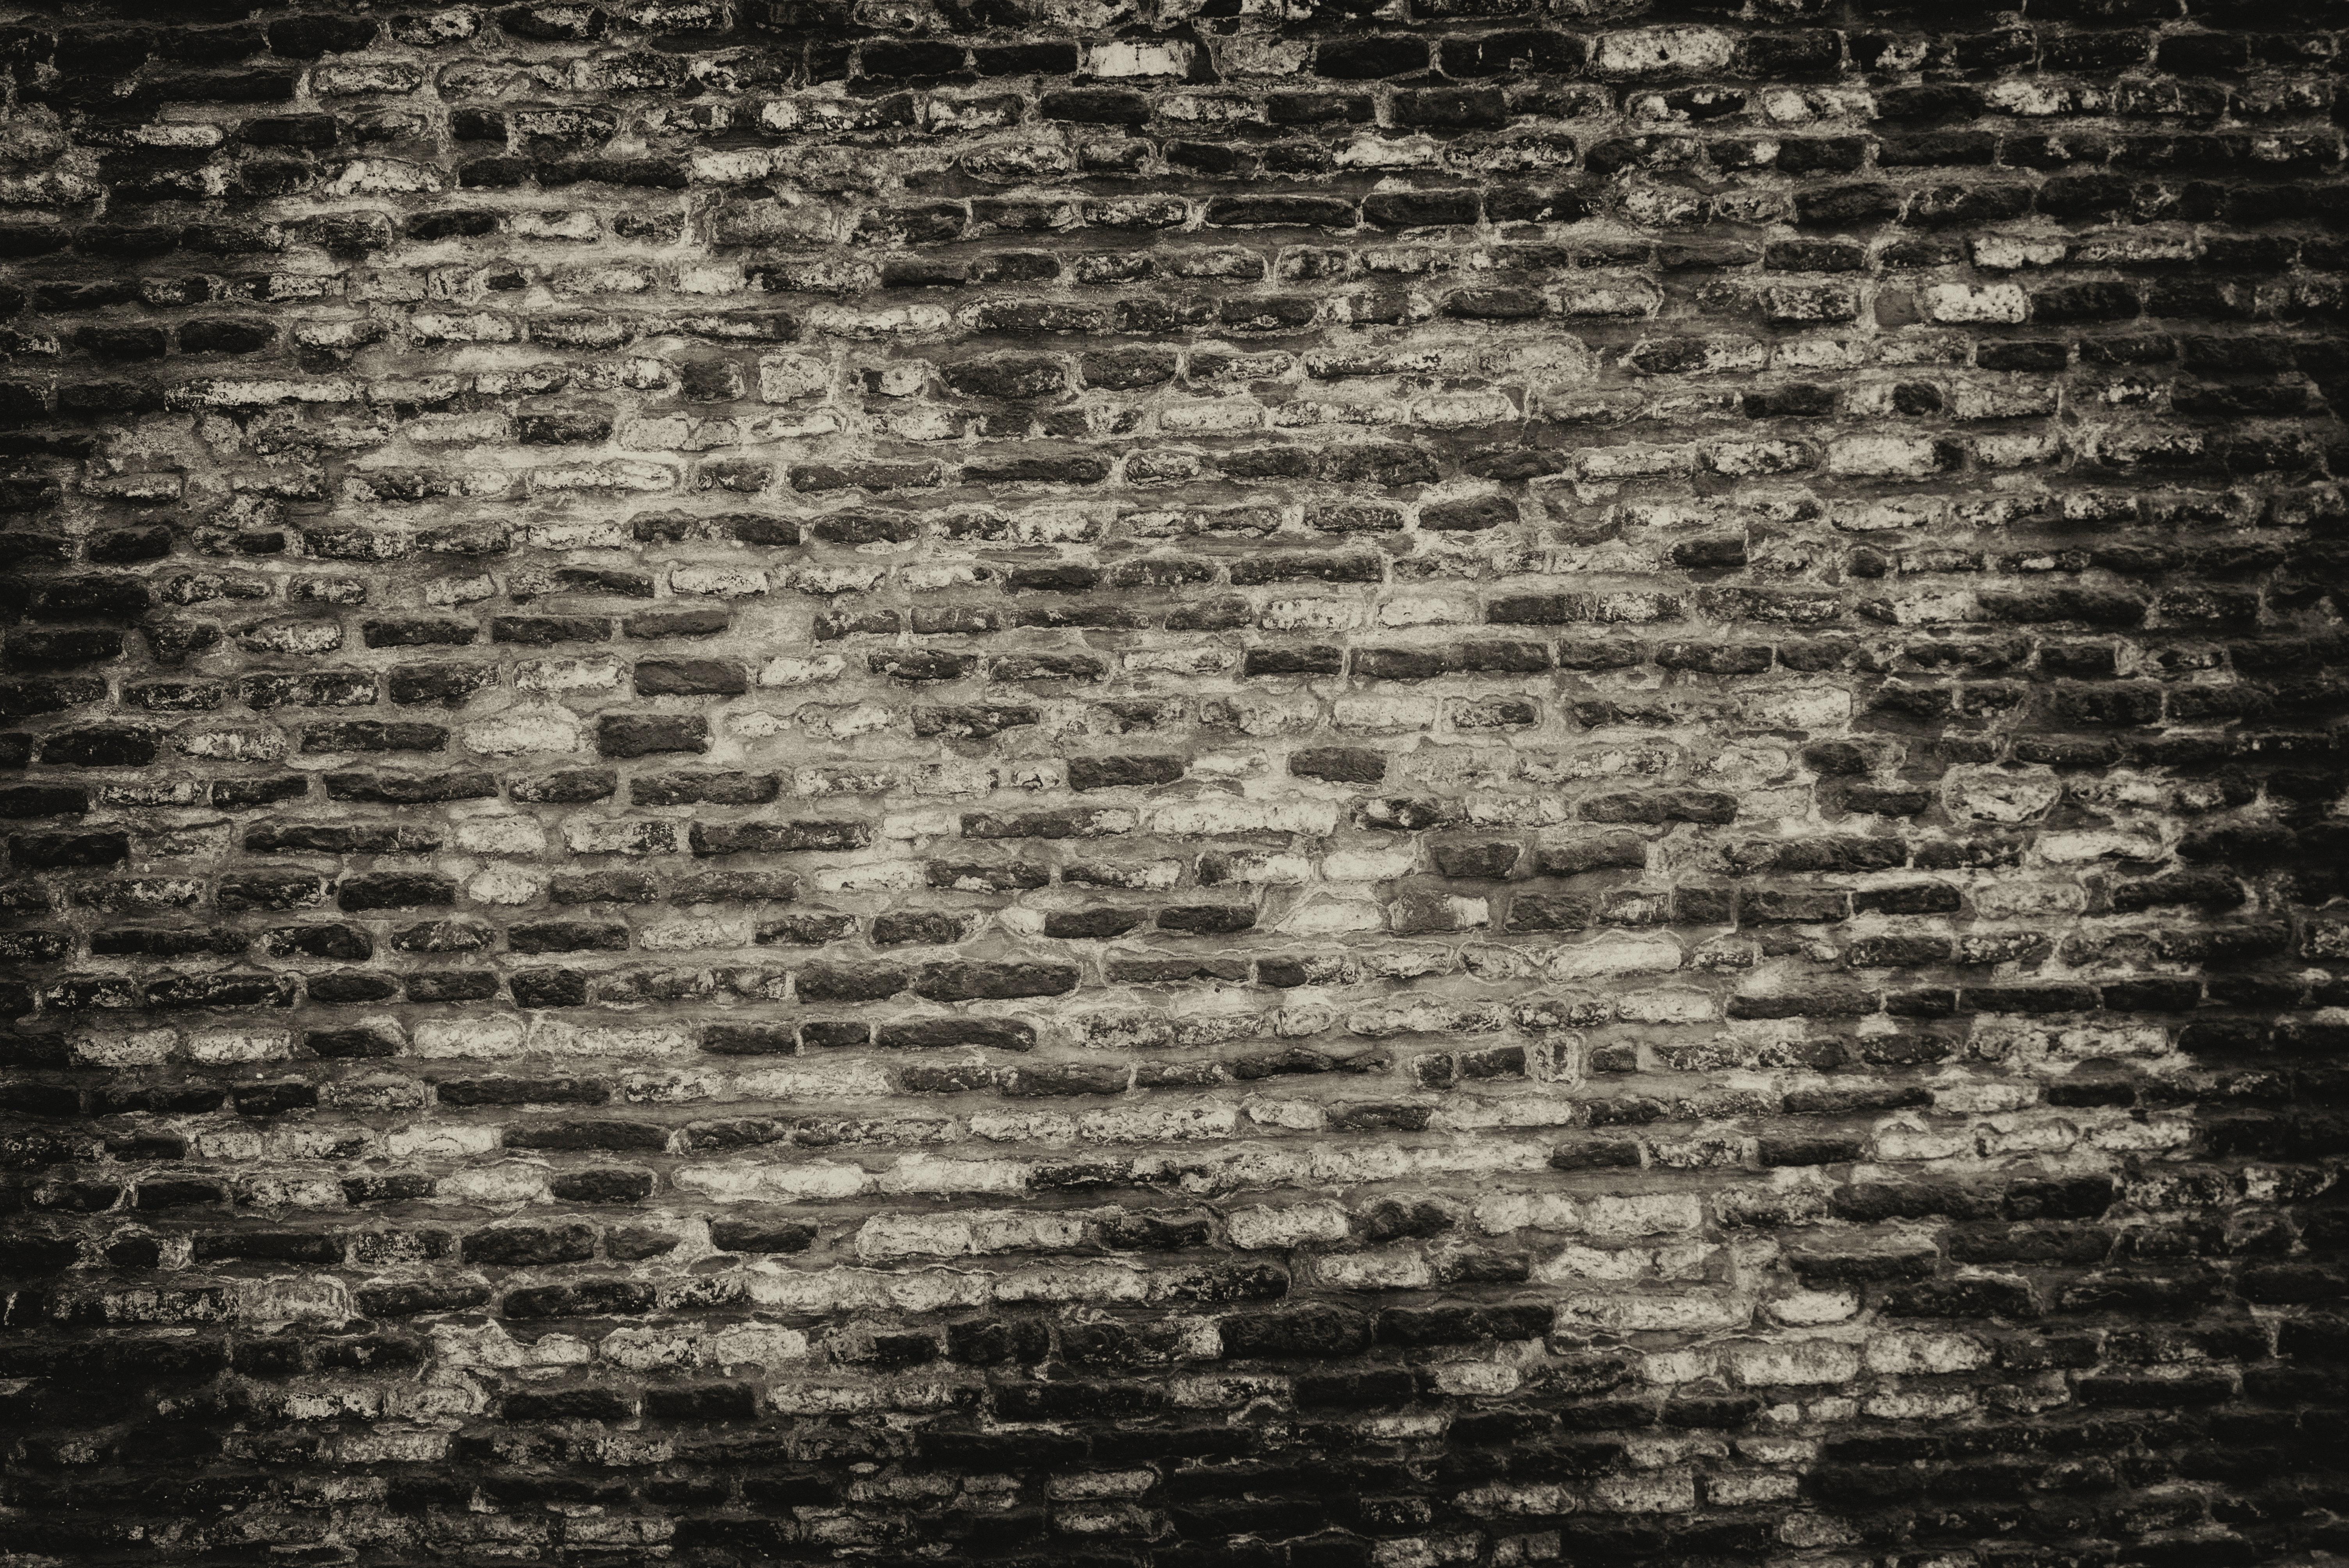 White concrete brick wall wallpaper rawpixel com grayscale photo of brickwall frans van heerden